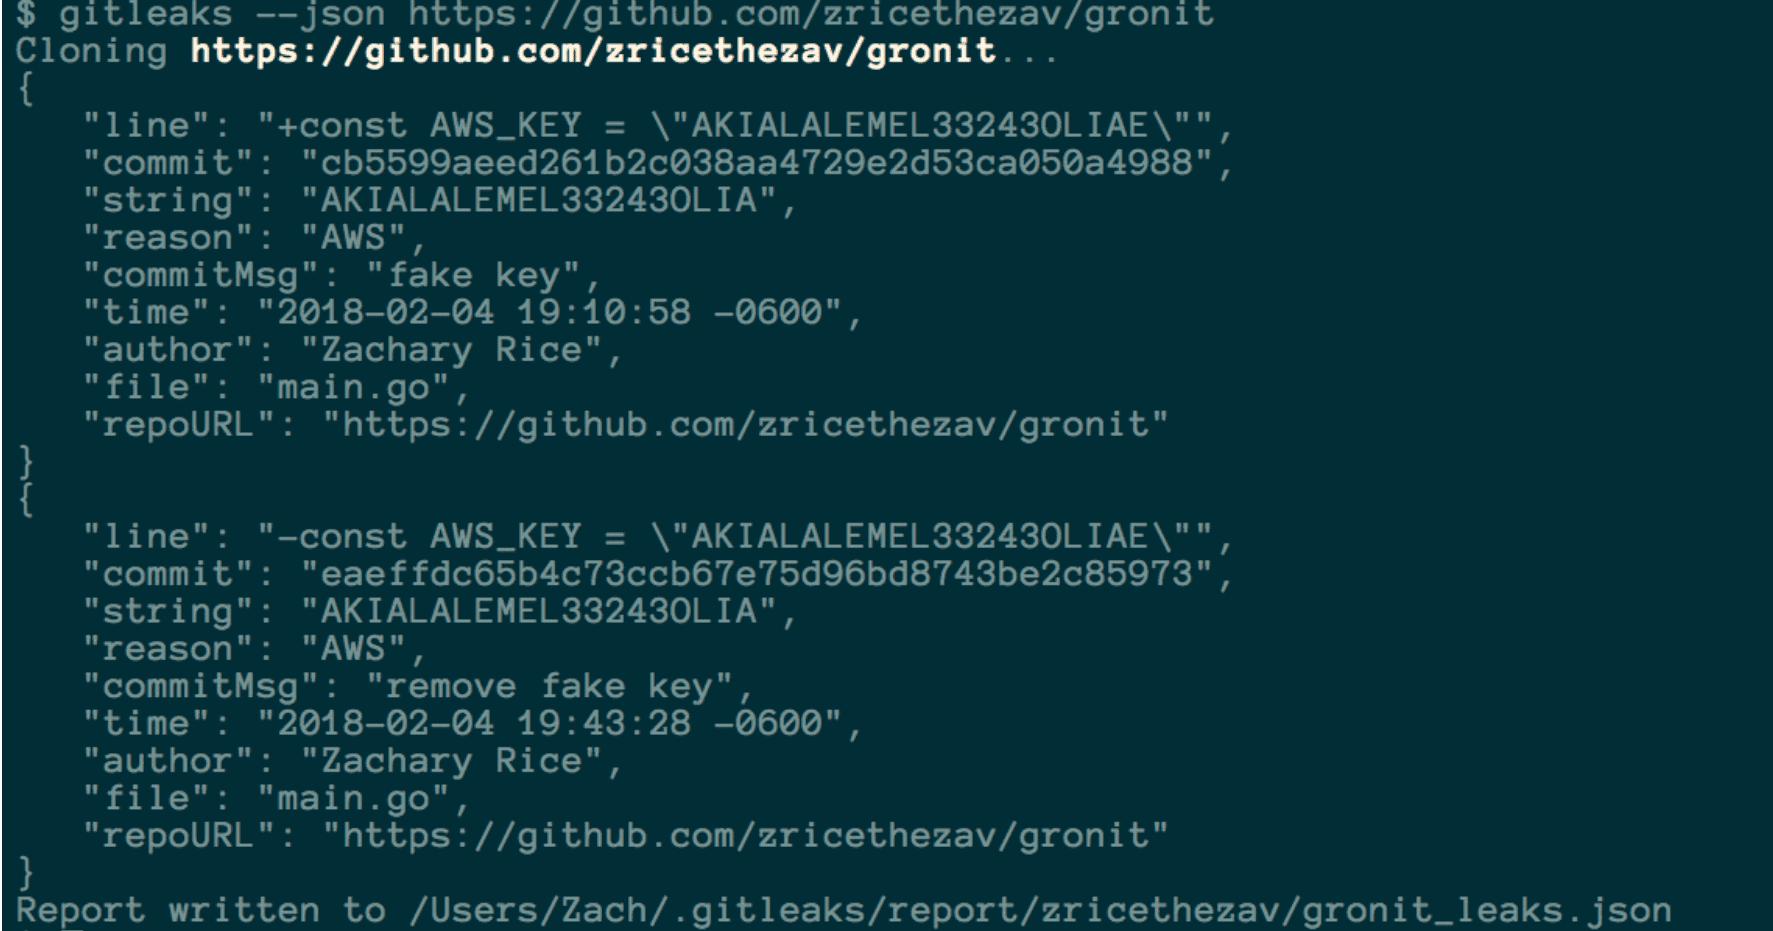 gitleaks v4.1.1 releases: Searches full repo history for secrets and keys